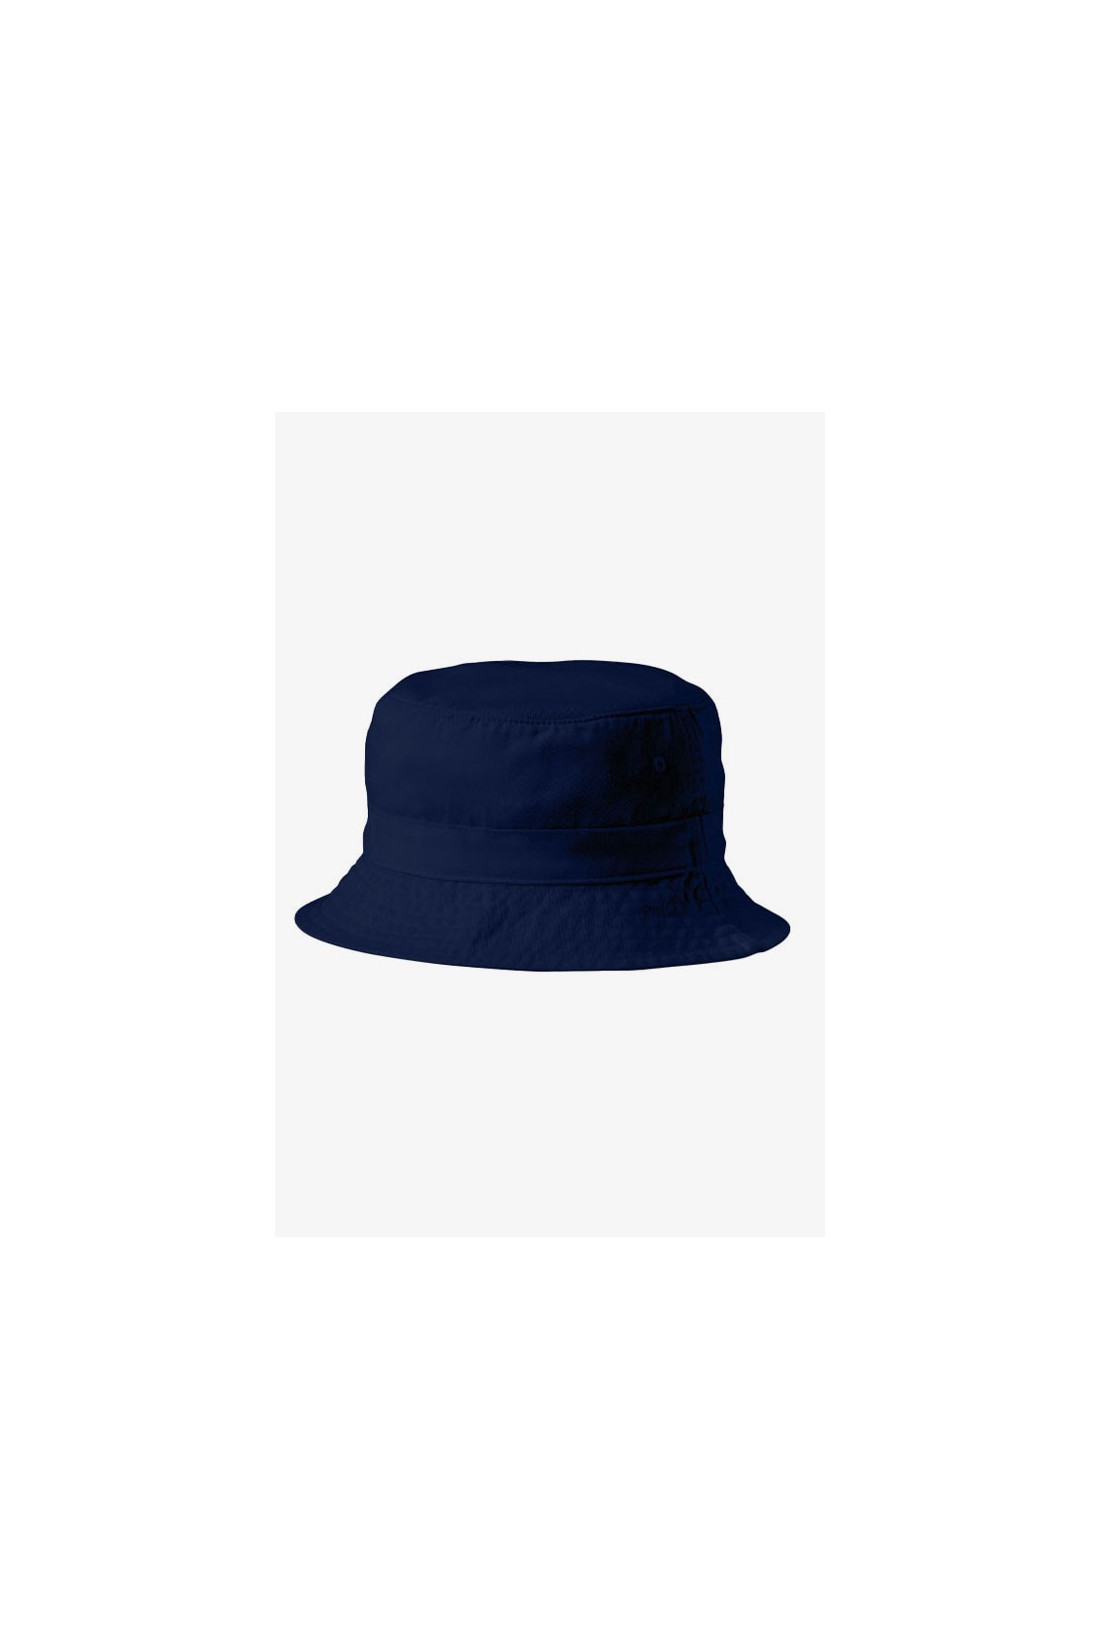 POLO RALPH LAUREN / Loft bucket hat cotton chino Newport navy